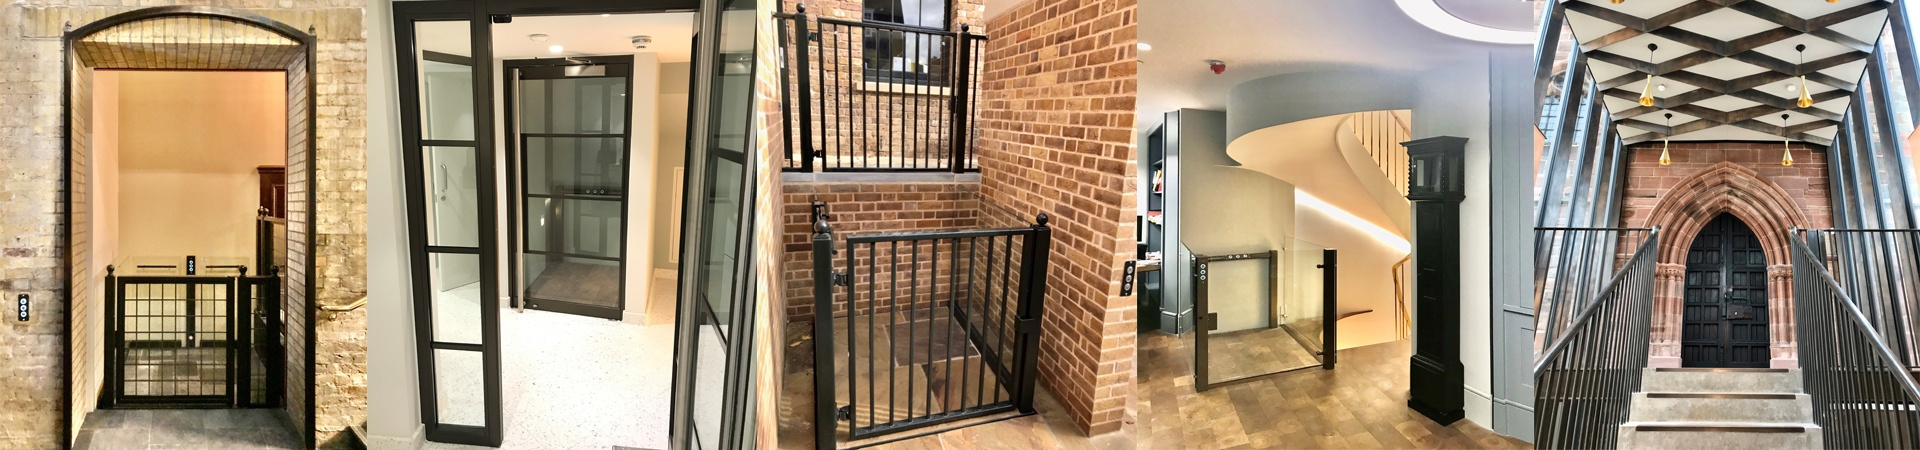 Heritage Wheelchair lift